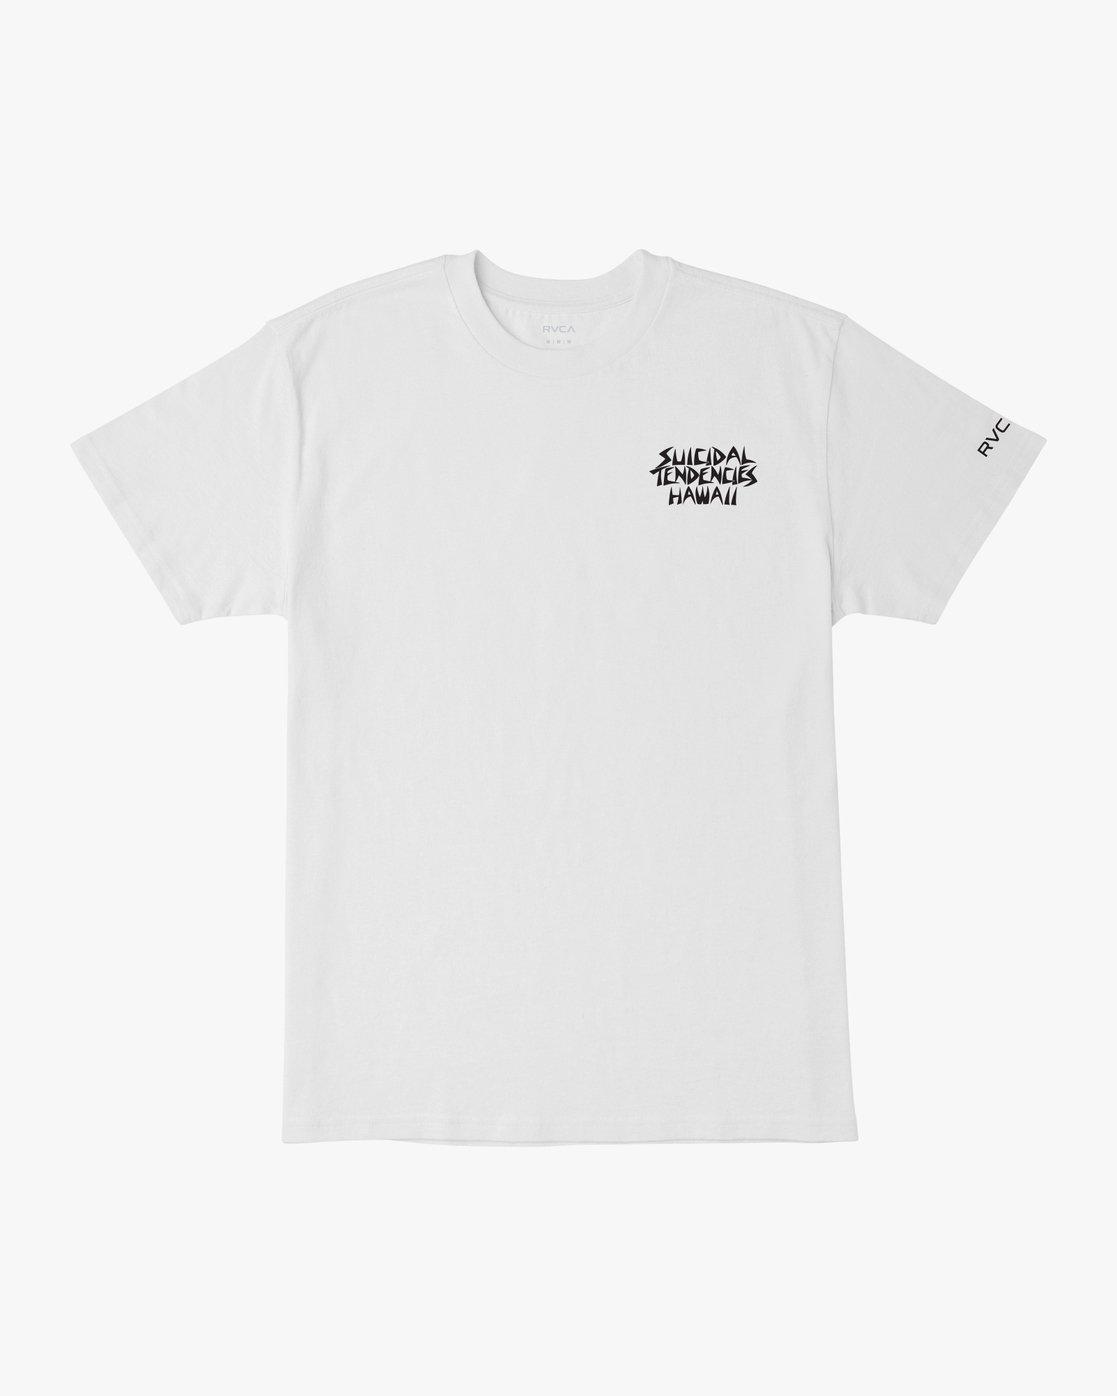 1 RVCA x Suicidal Tendencies T-Shirt White M419TRSU RVCA